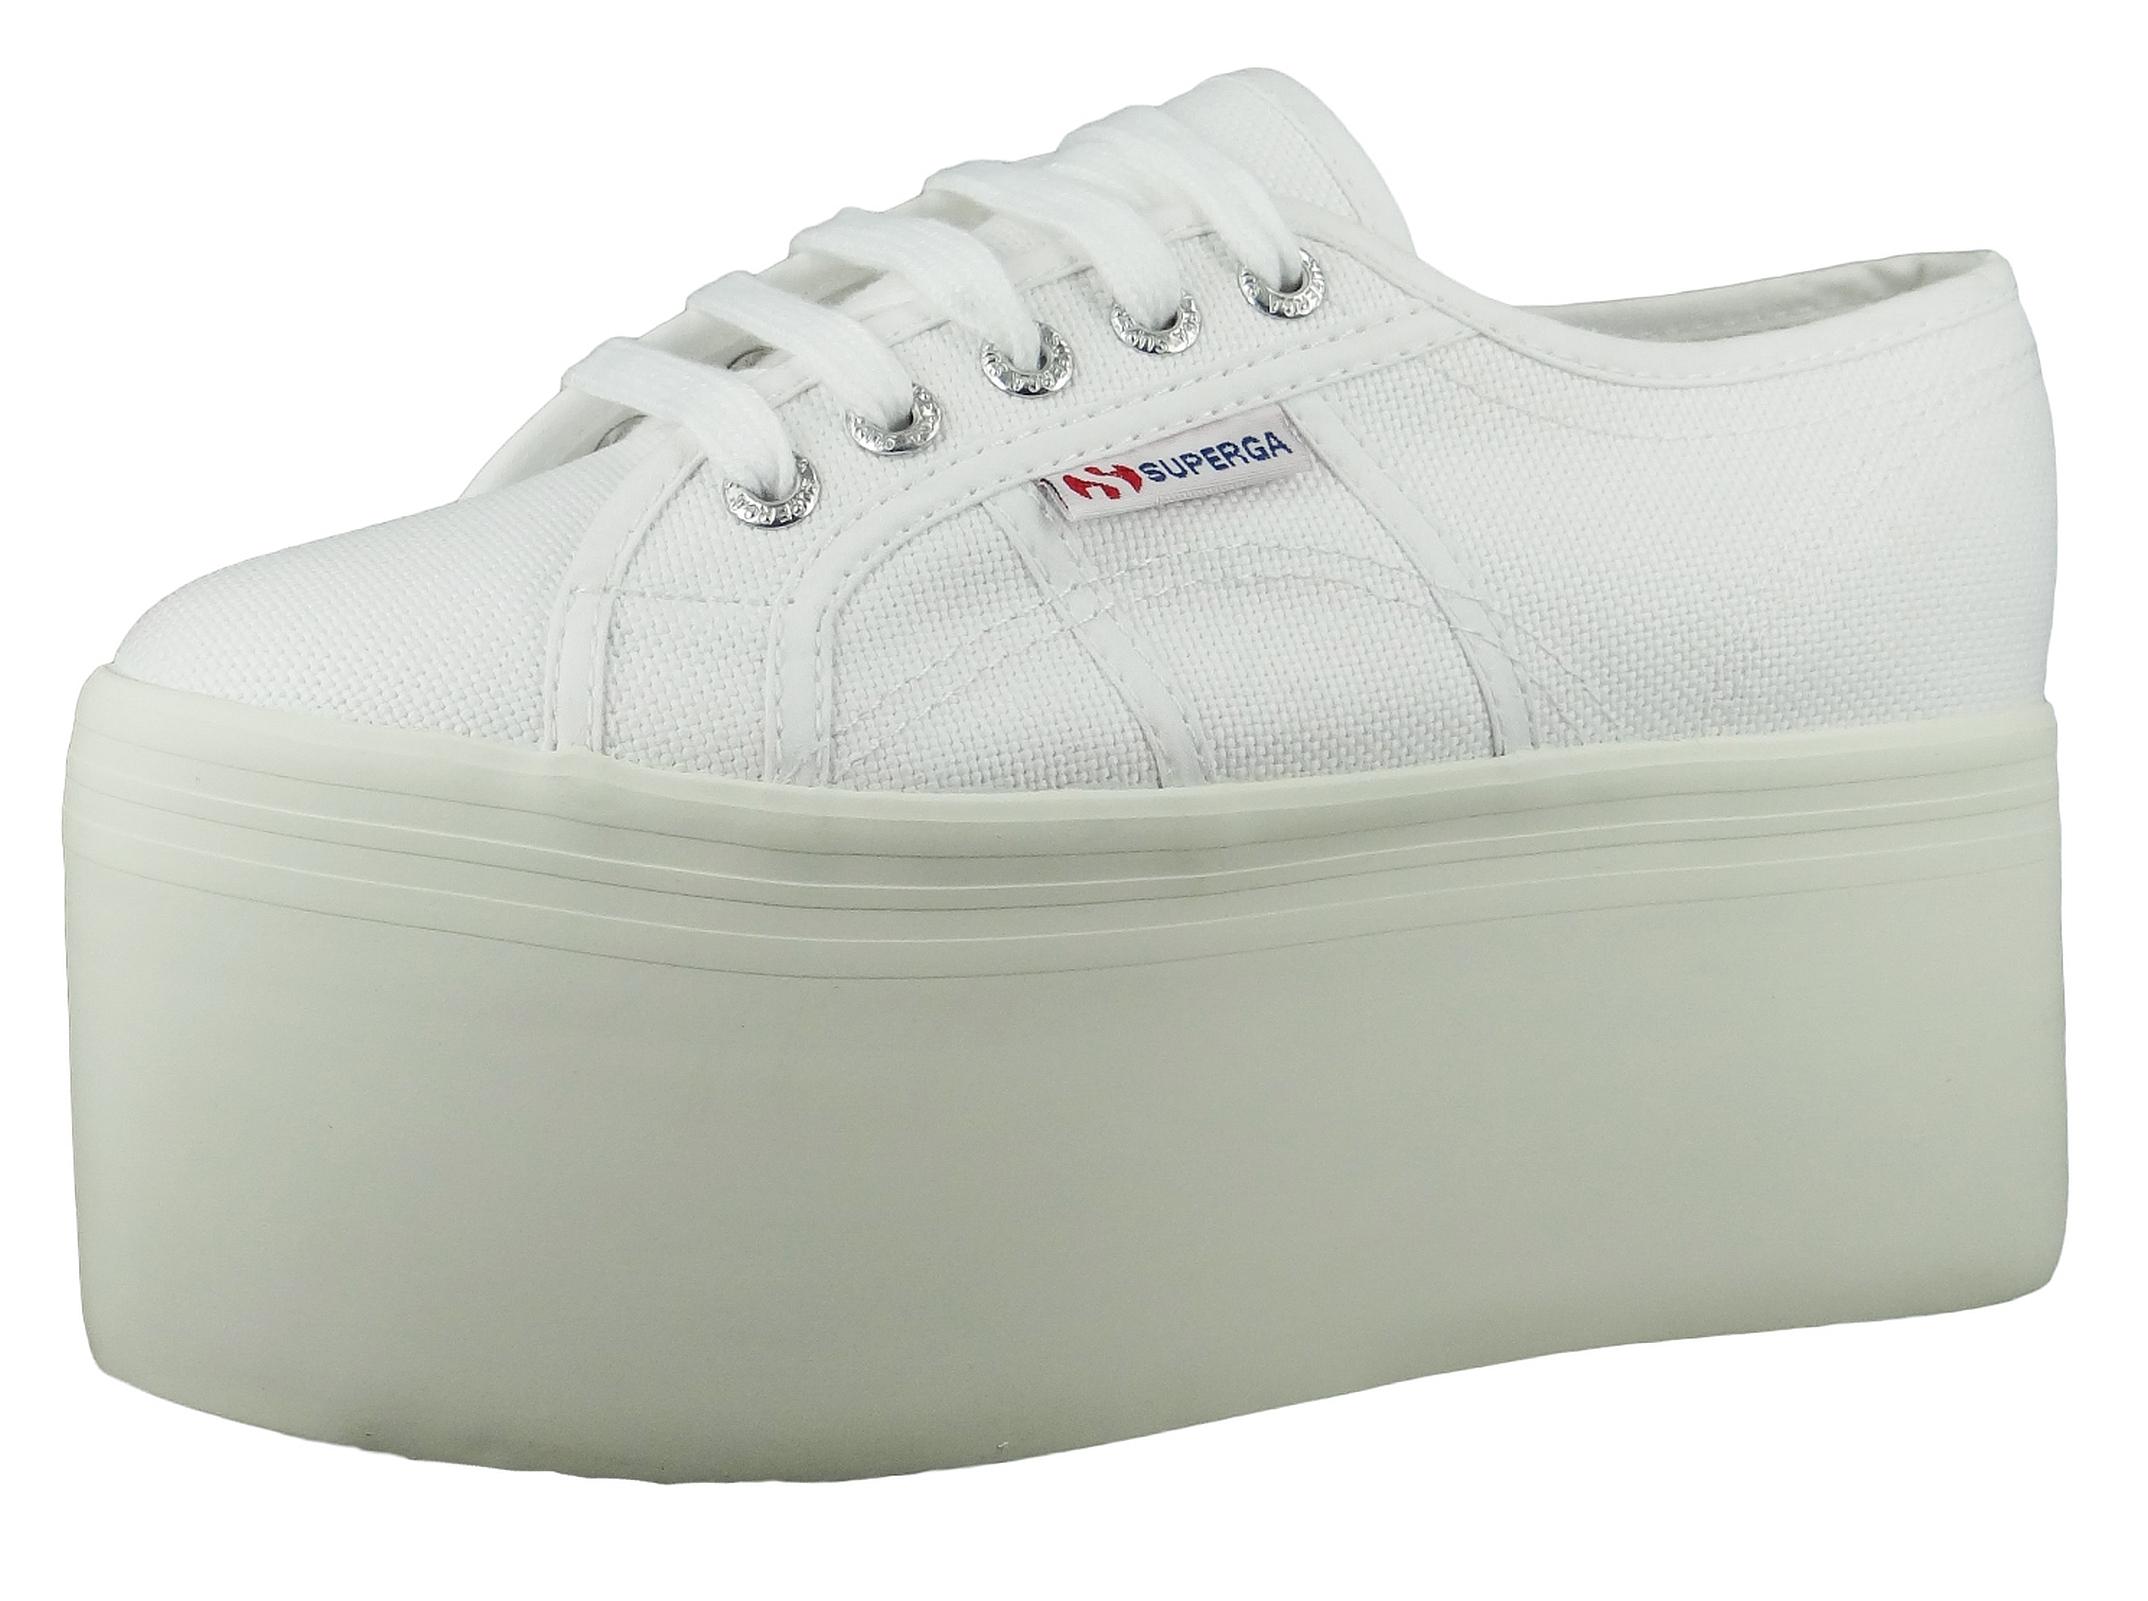 Art Shoes Lace-up Libertad Black White